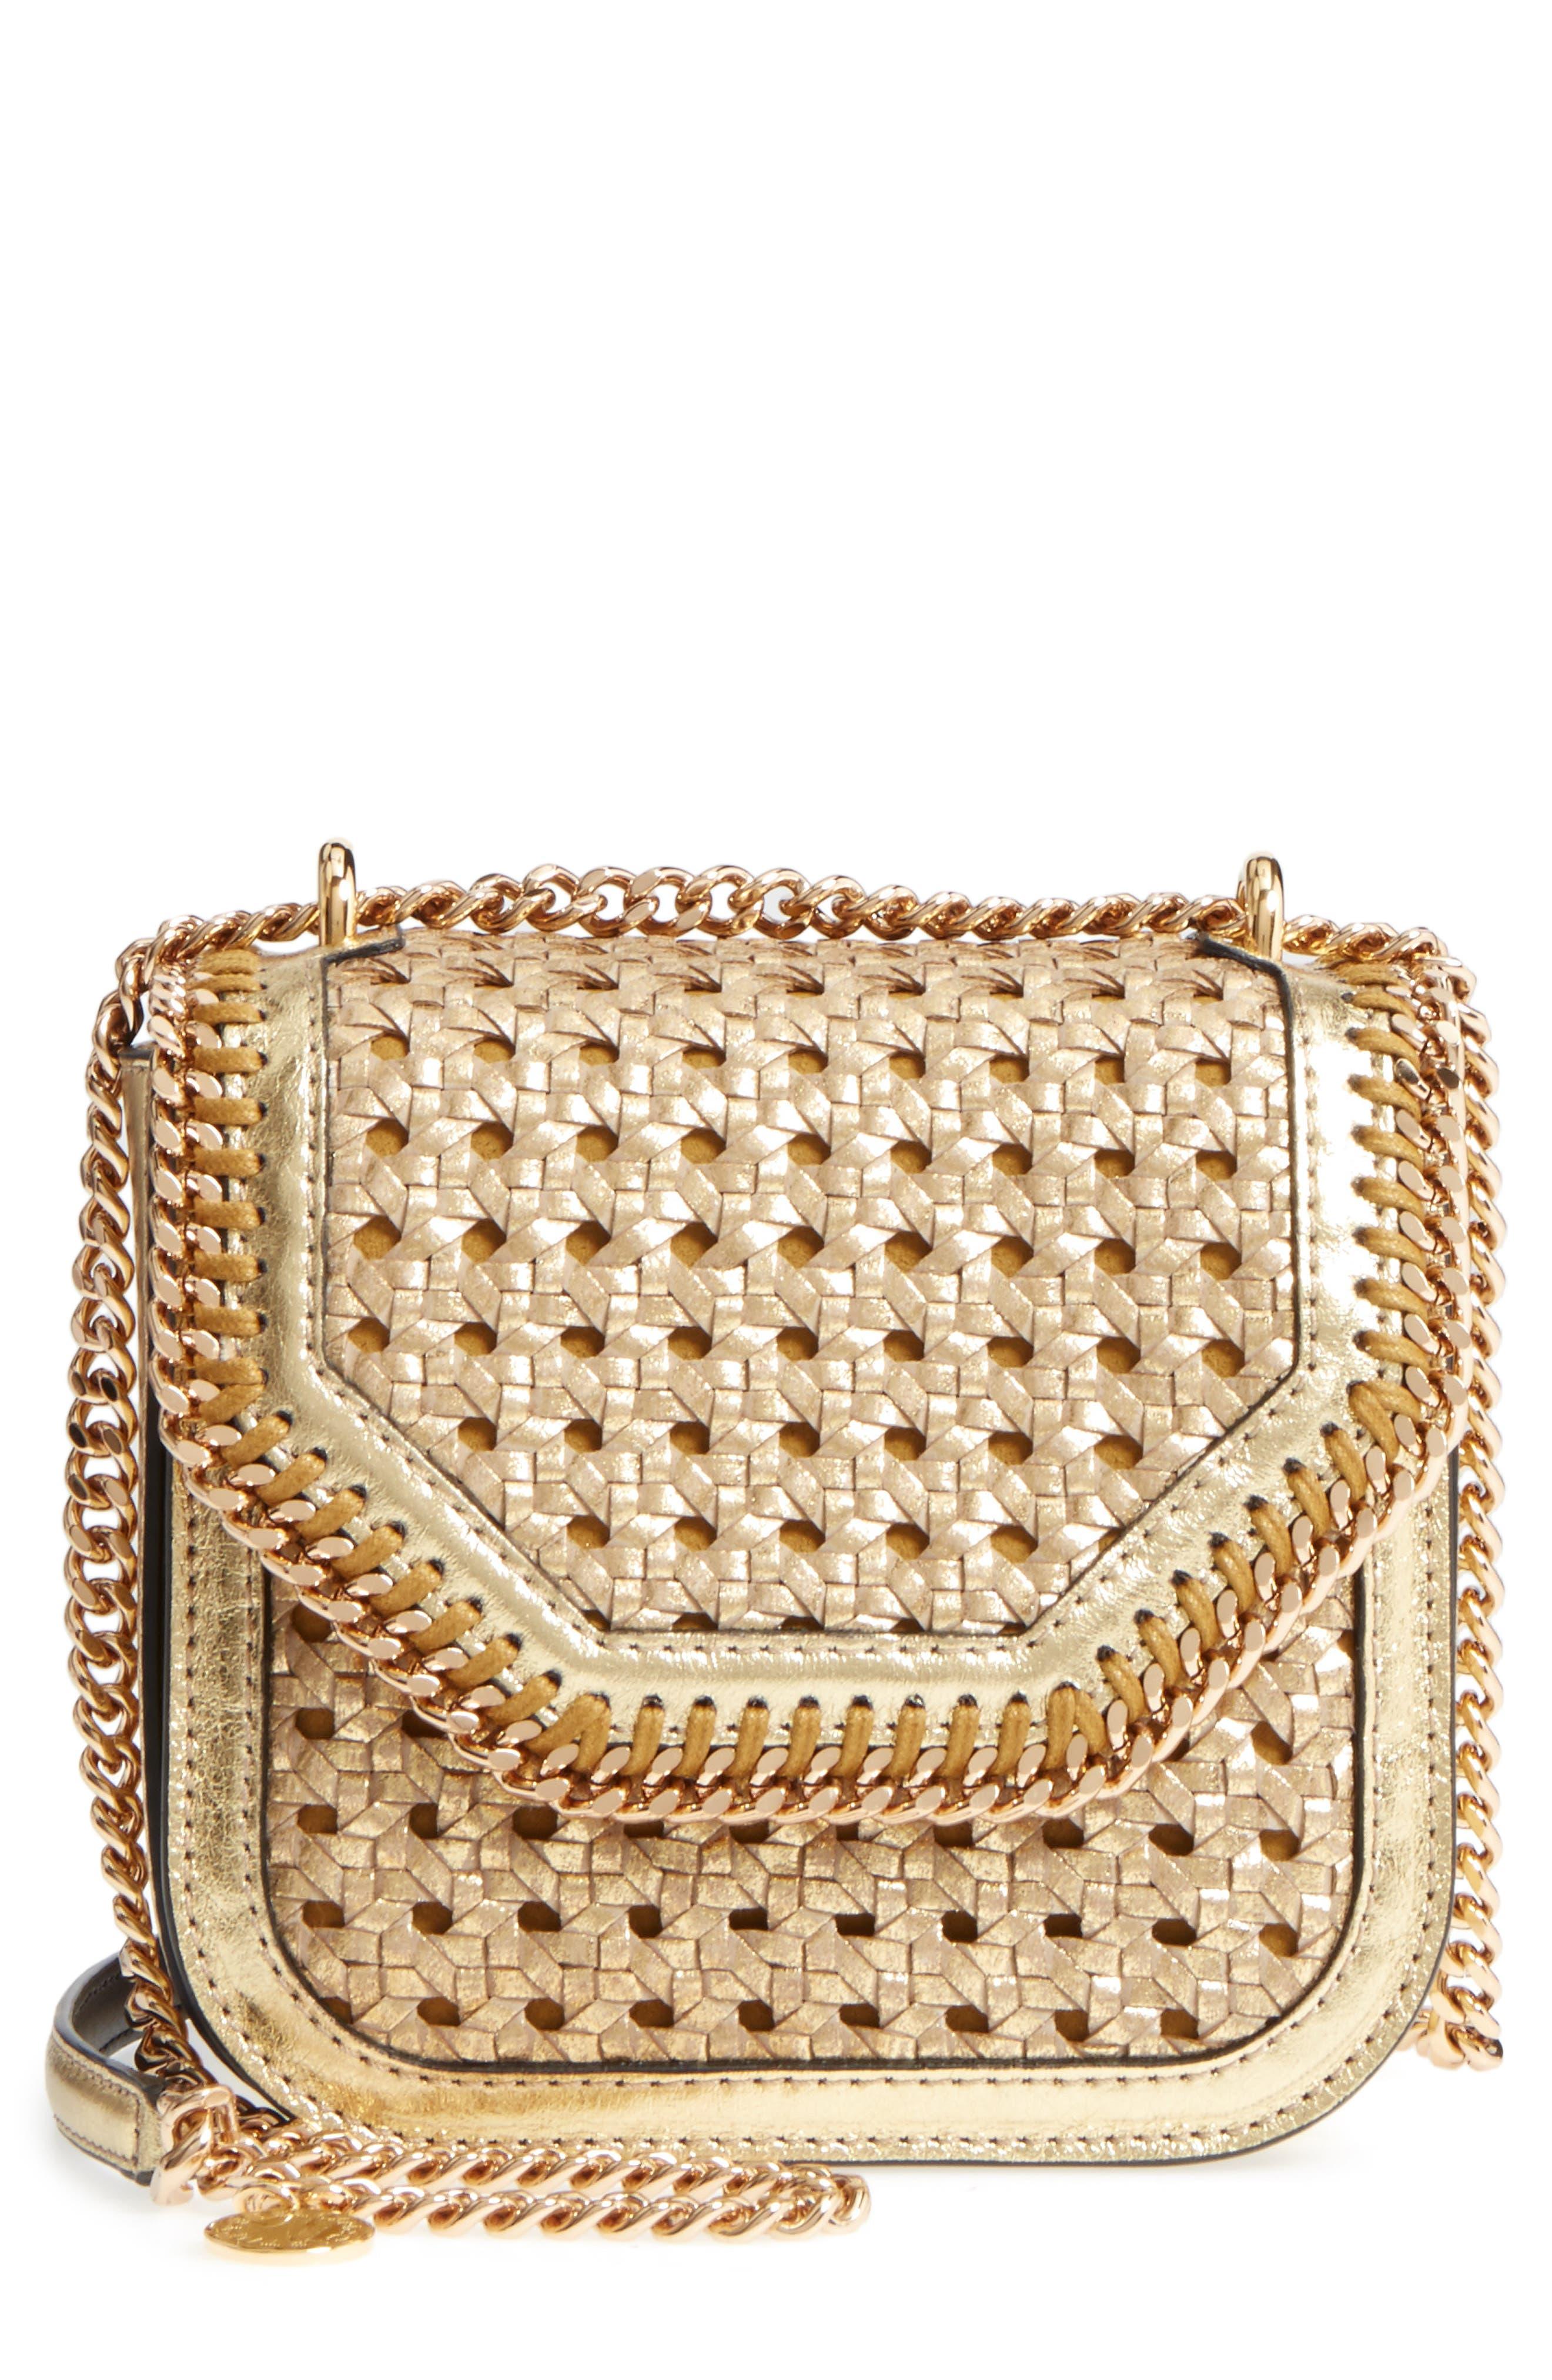 Main Image - Stella McCartney Falabella Box Woven Metallic Faux Leather Shoulder Bag